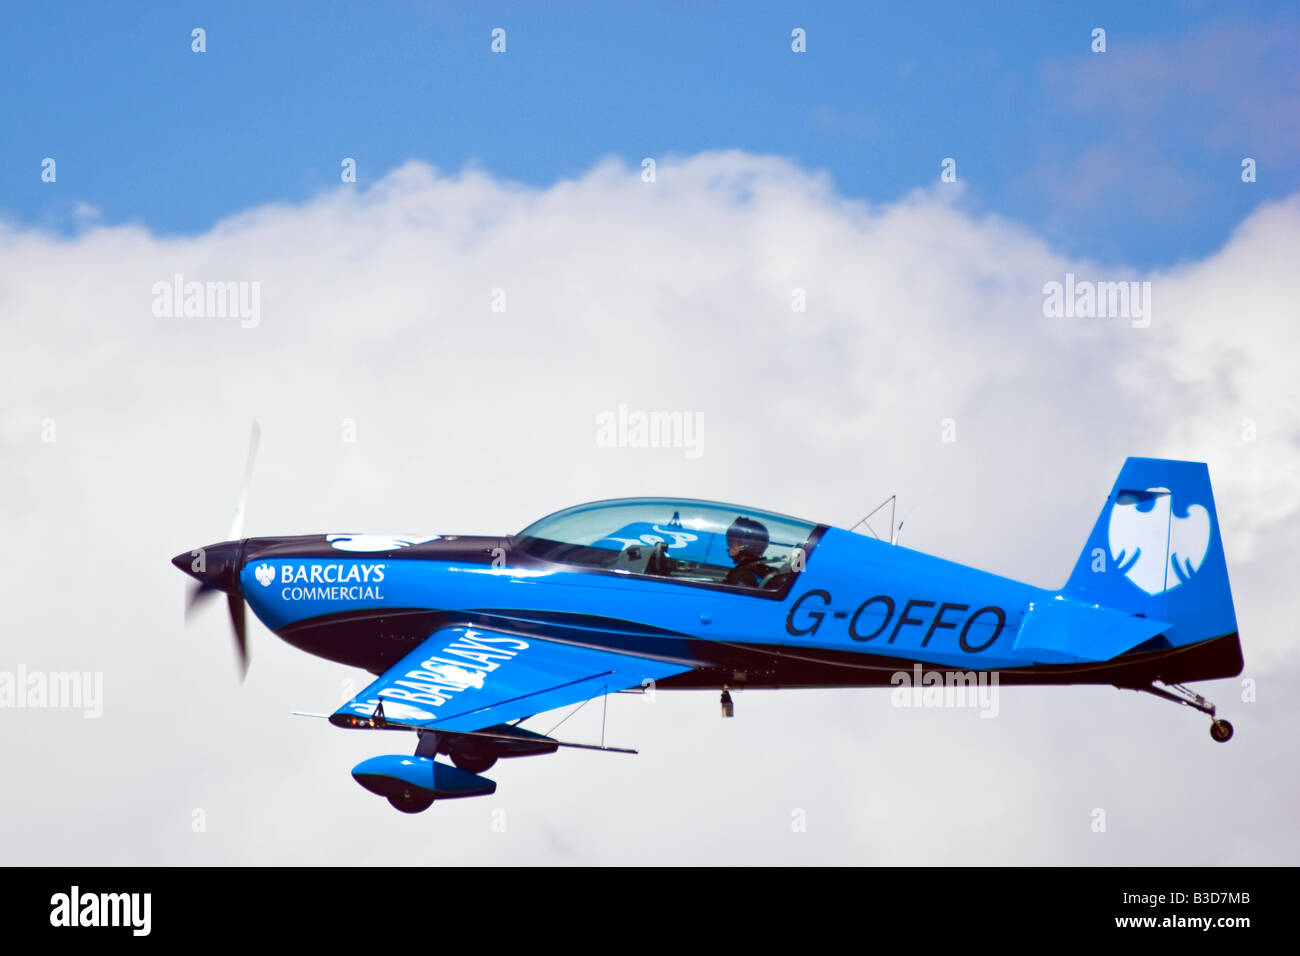 The Blades Aerobatic Team at the Wings and wheels display at Dunsfold Surrey UK 2008 - Stock Image